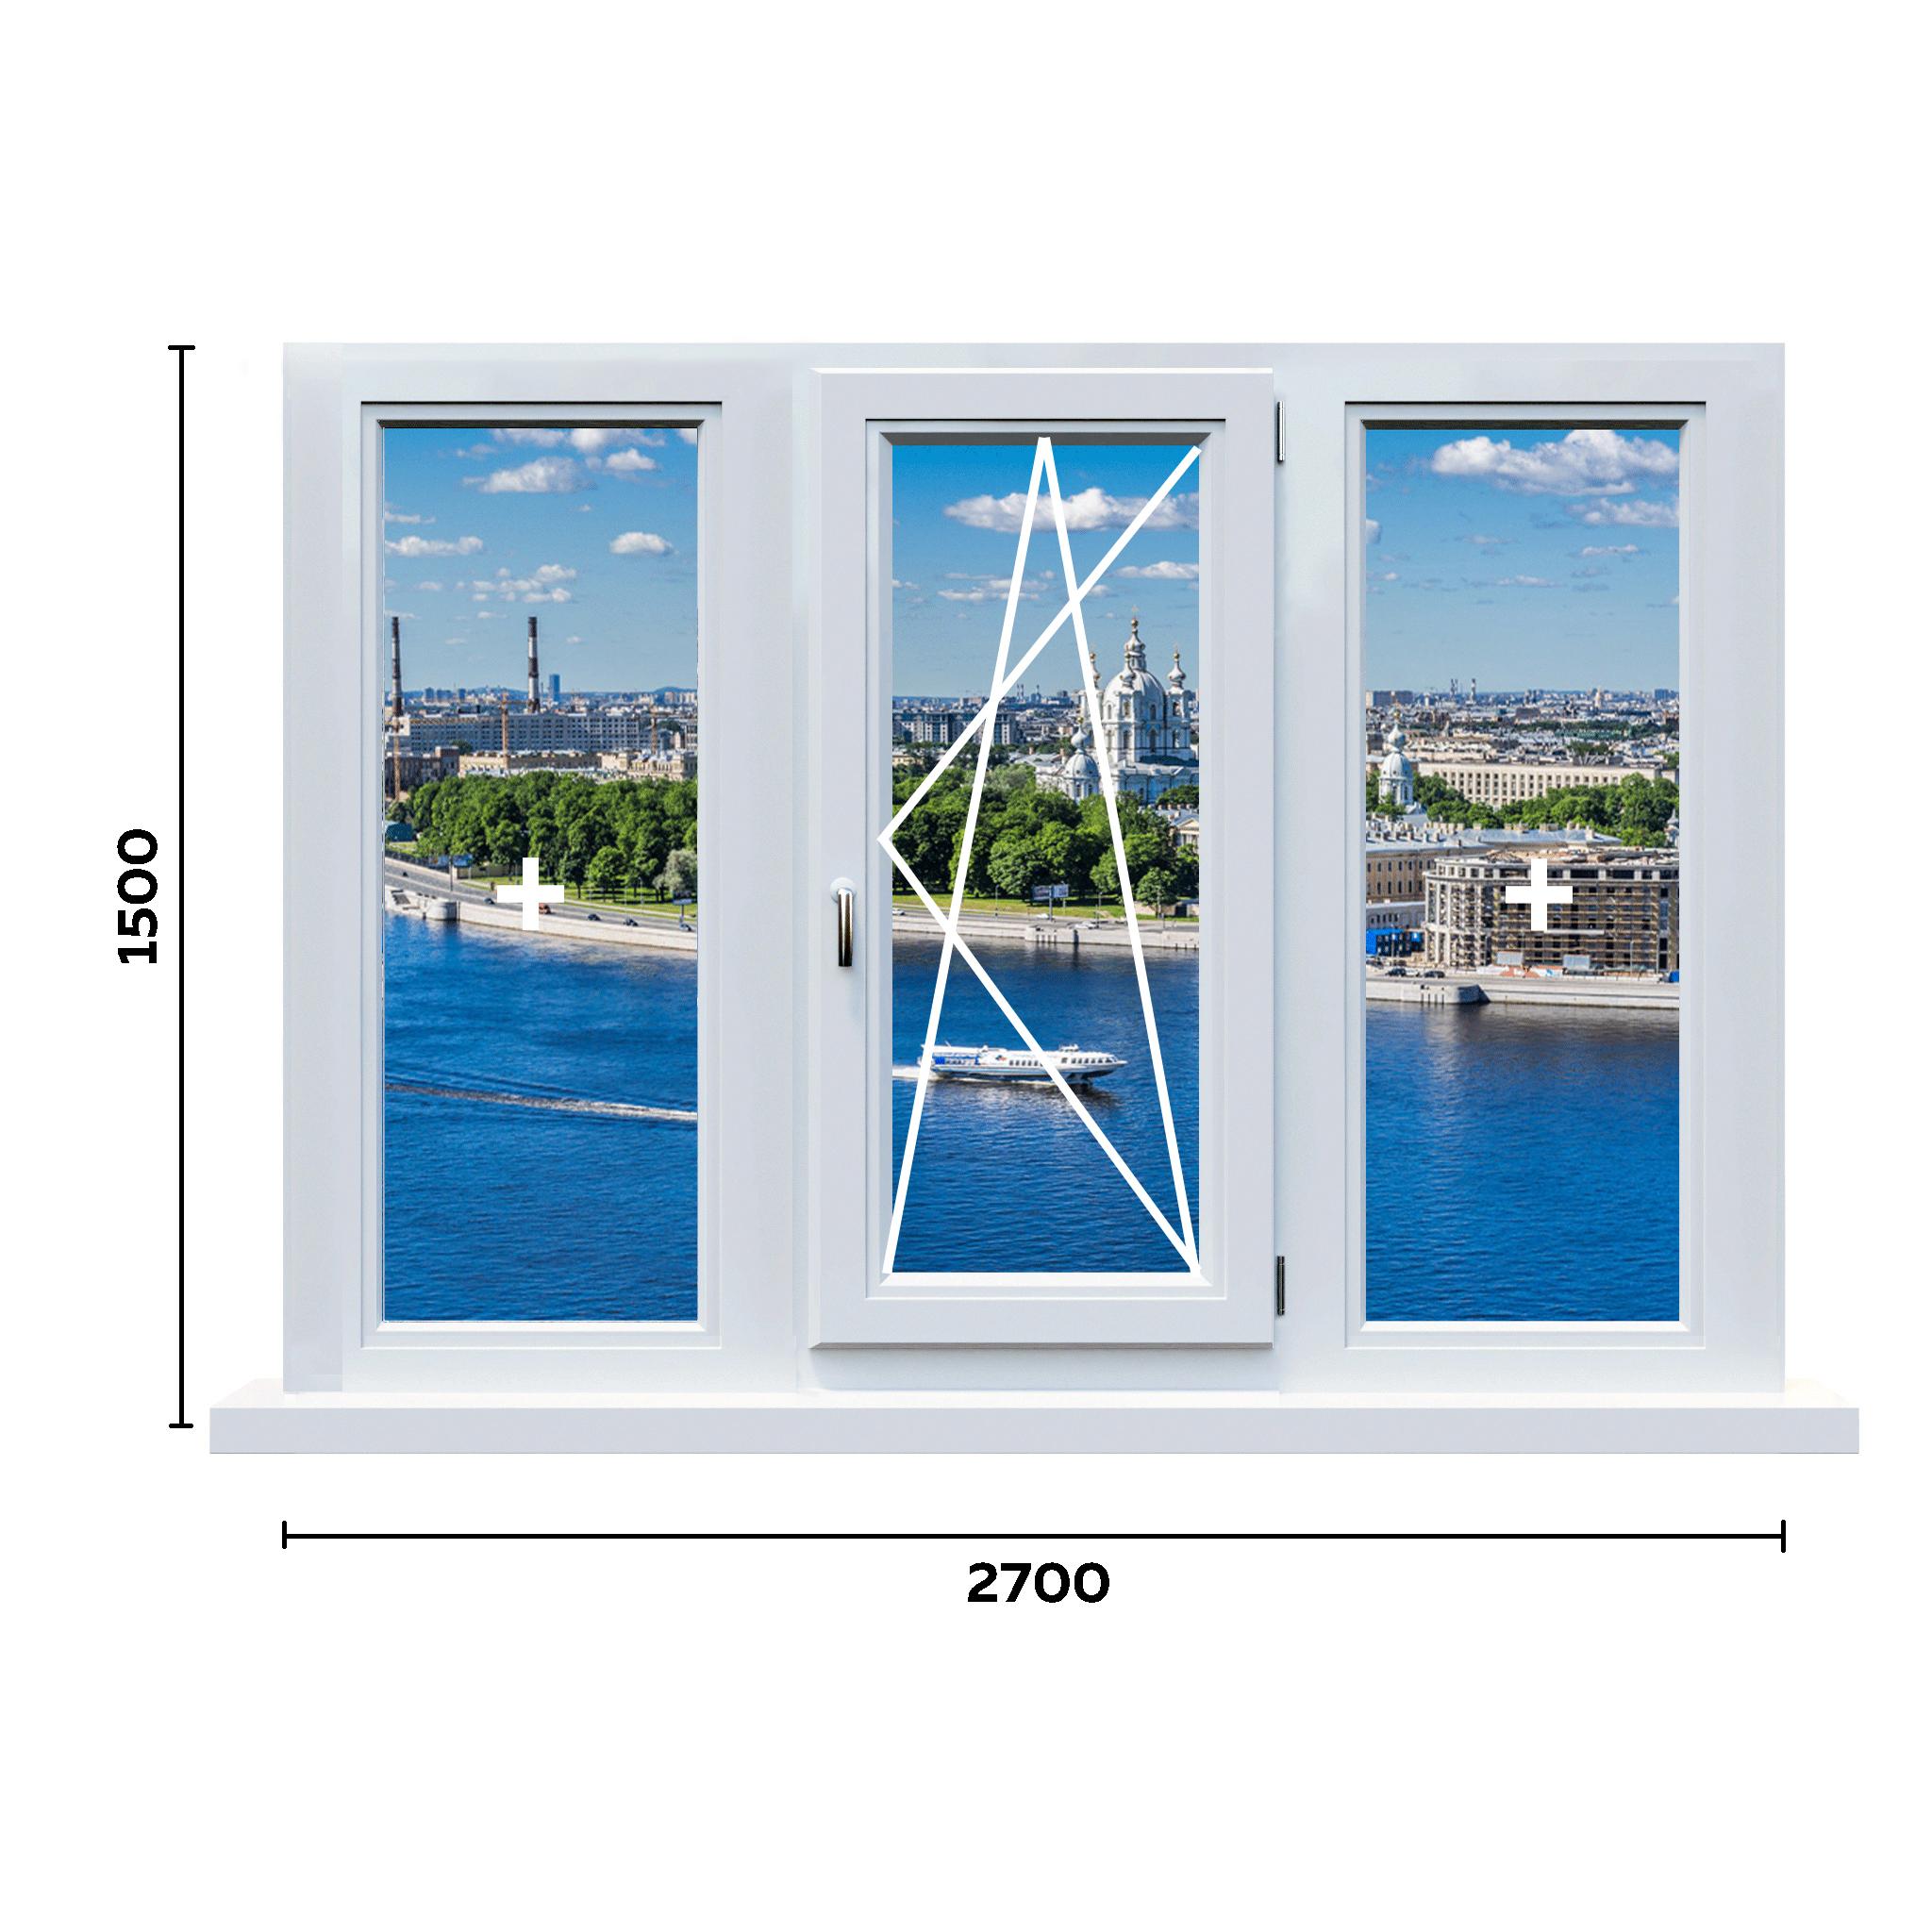 схема окна 2700мм вариант 1